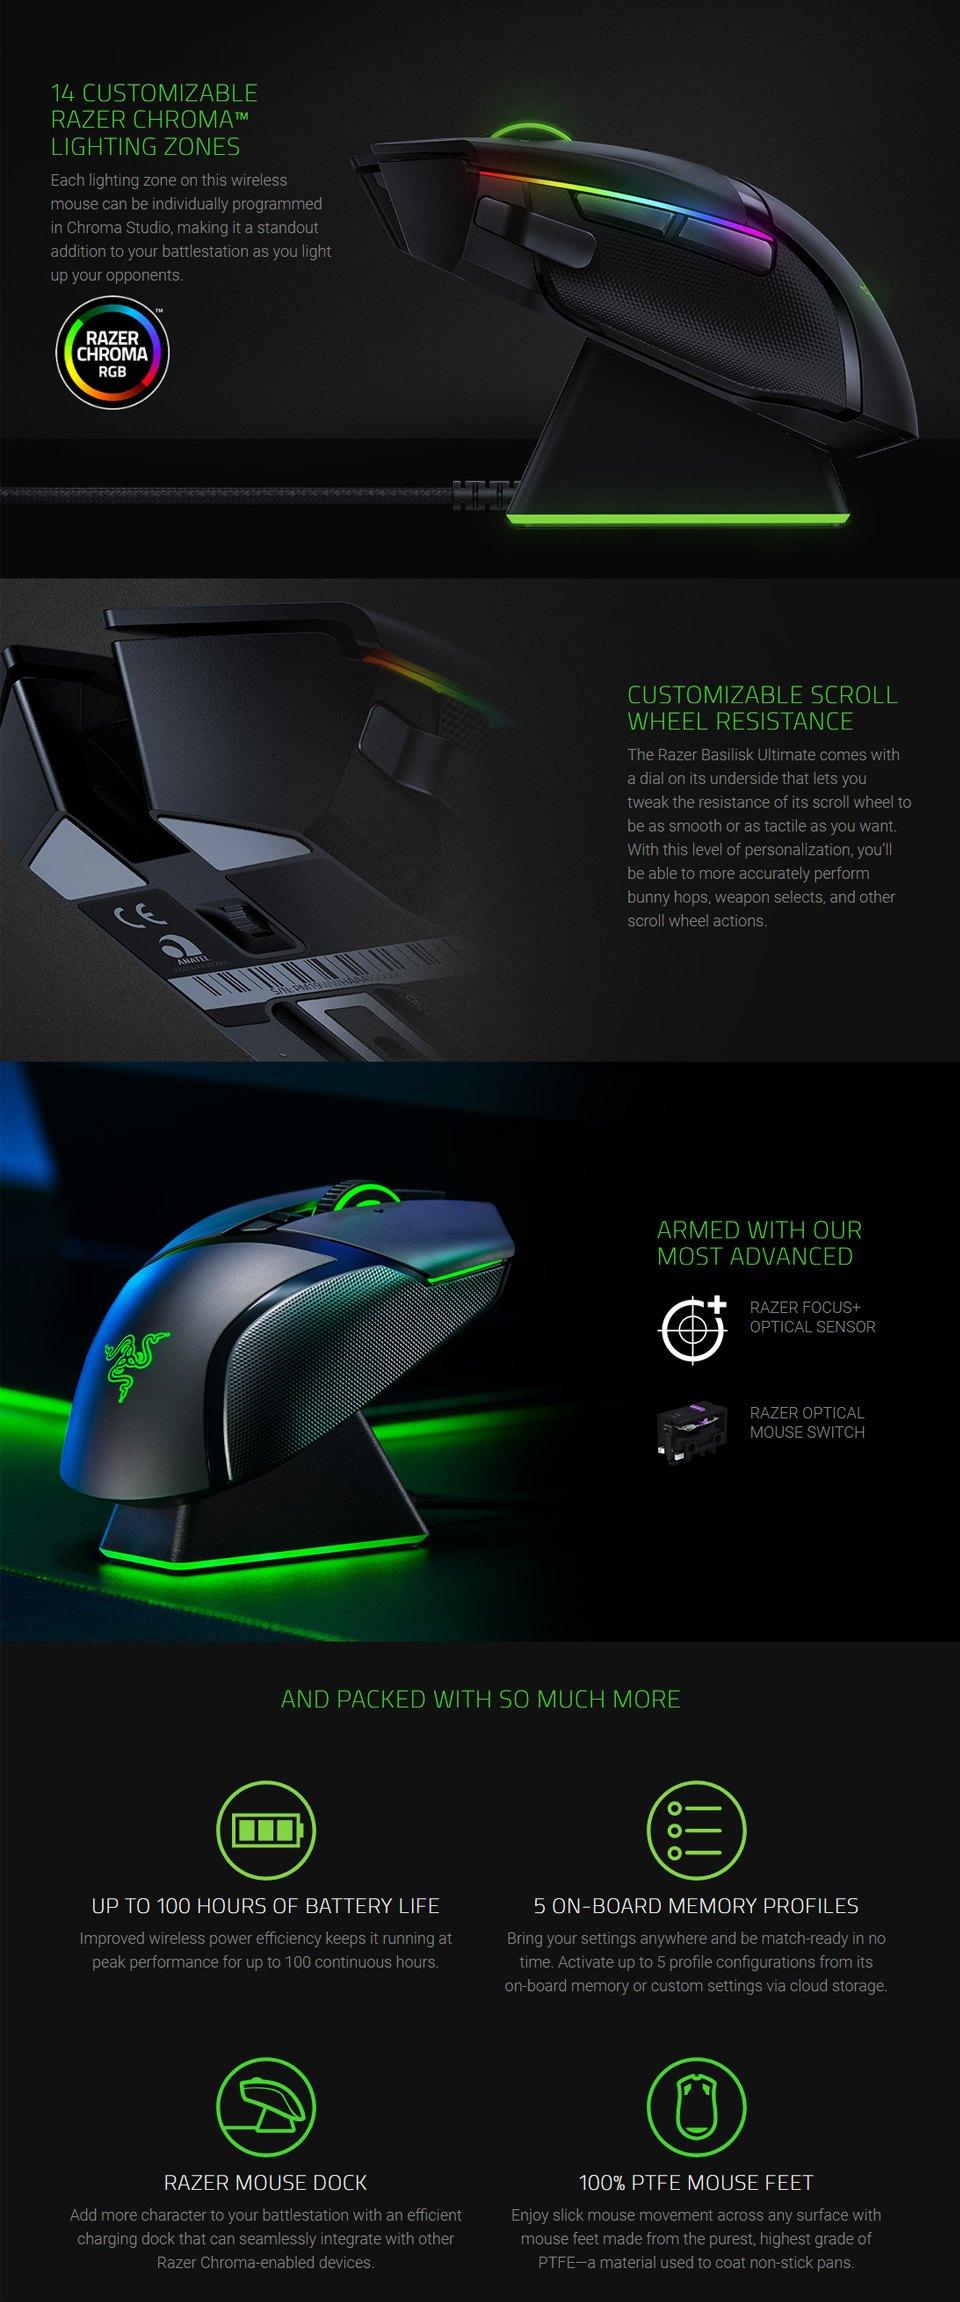 Razer Basilisk Ultimate Wireless Optical Gaming Mouse features 2